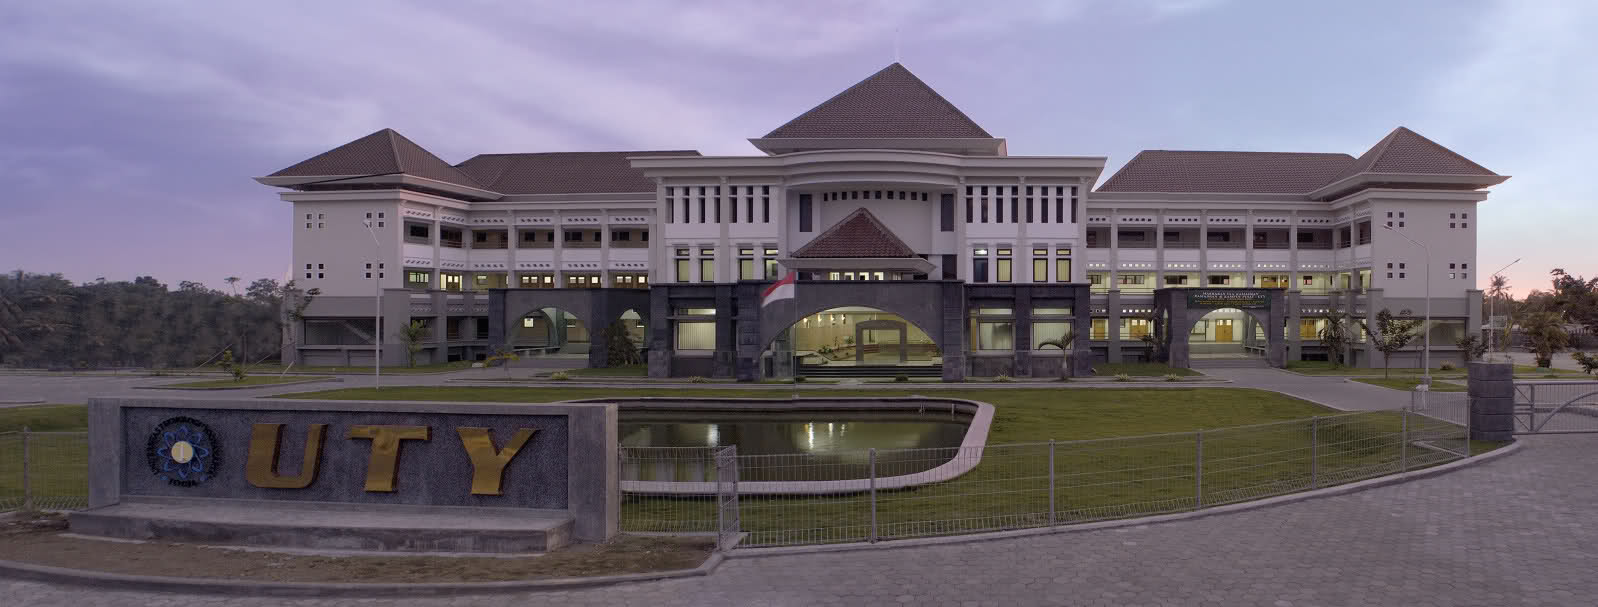 Program Studi Magister Universitas Teknologi Yogyakarta (UTY)